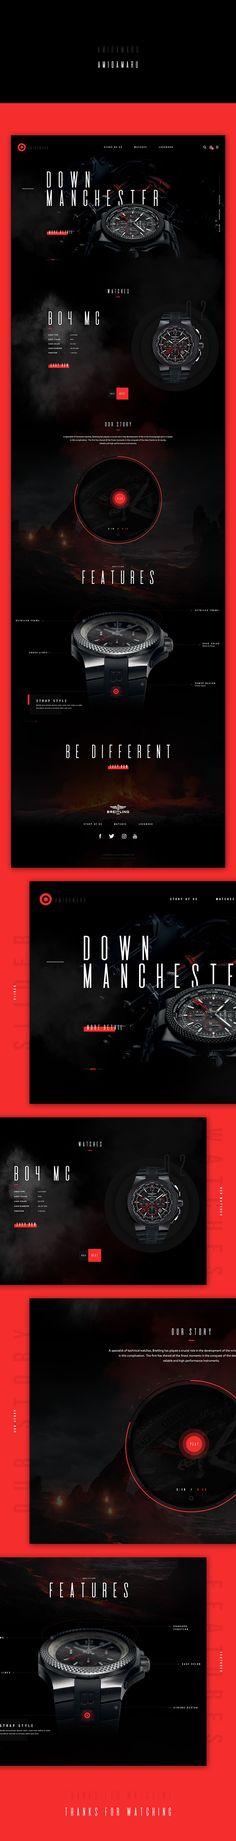 I created for the Amidamaru new web site design